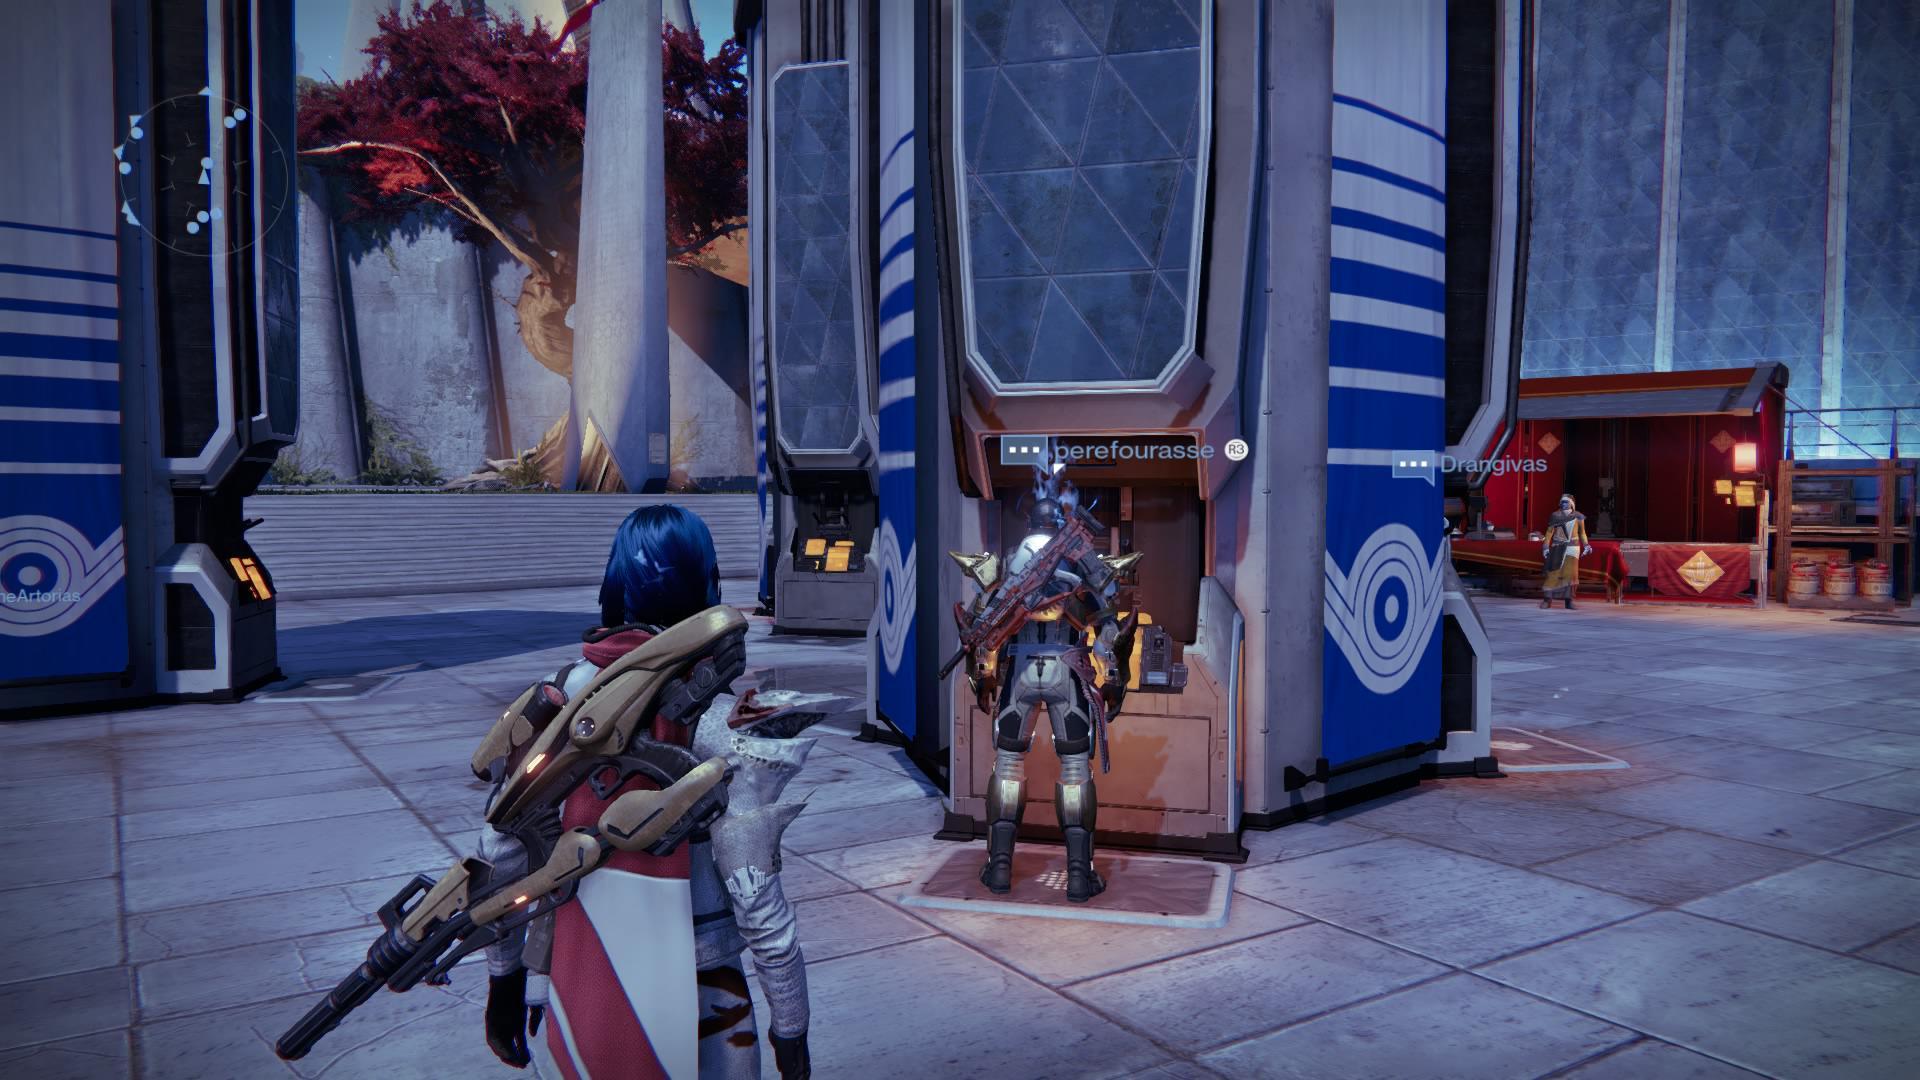 Perefourasse est à la tour ! :3 #destinythegame #destiny #PS4share http://t.co/RNUDVJYj7u